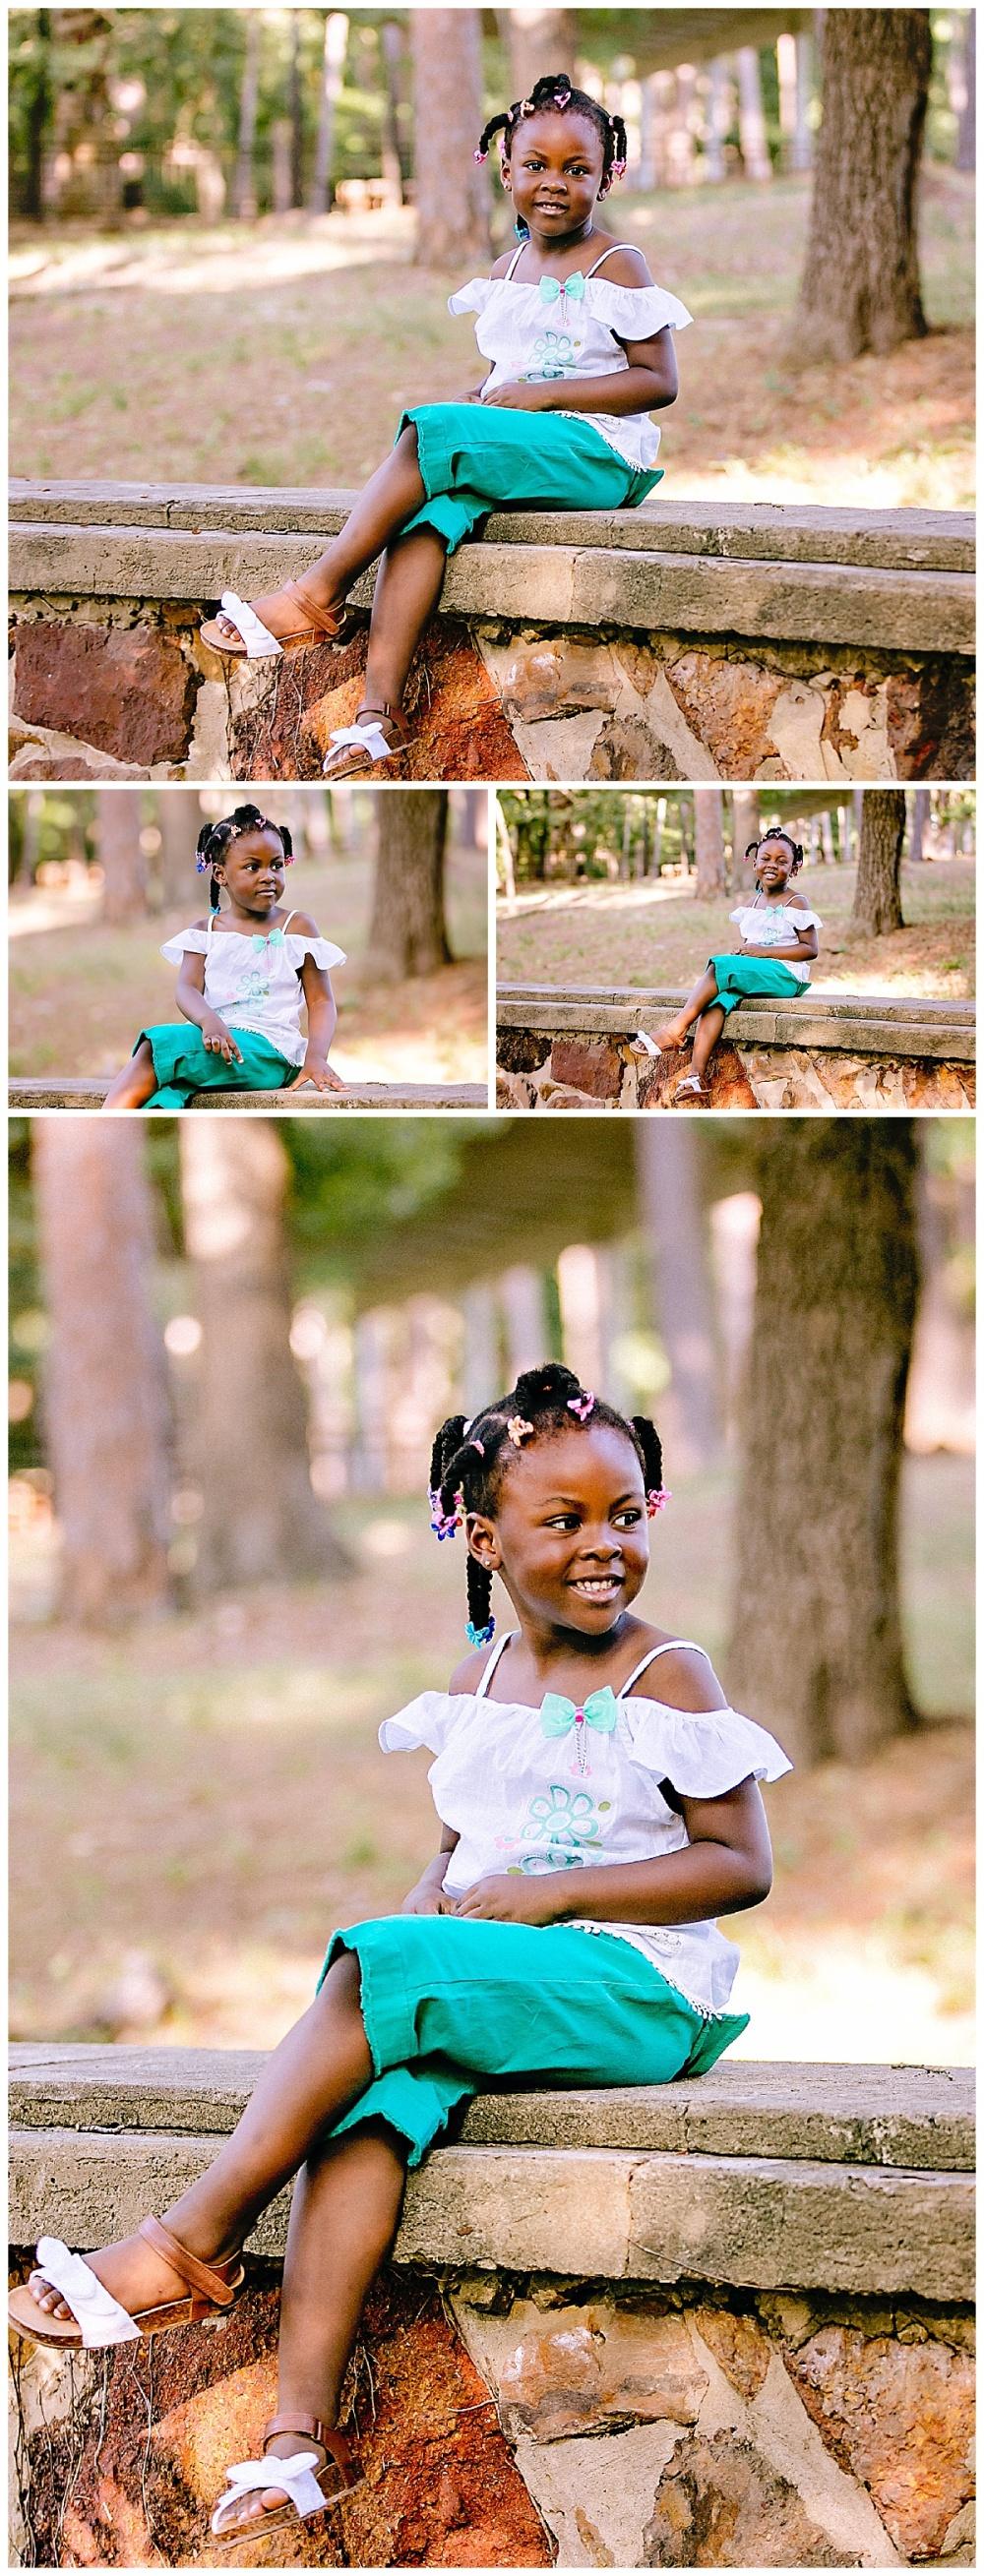 Carly-Barton-Photography-Family-Session-Kilgore-Texas-Twins-1-year-birthday-cake-smash-Olowo-family-photos_0033.jpg